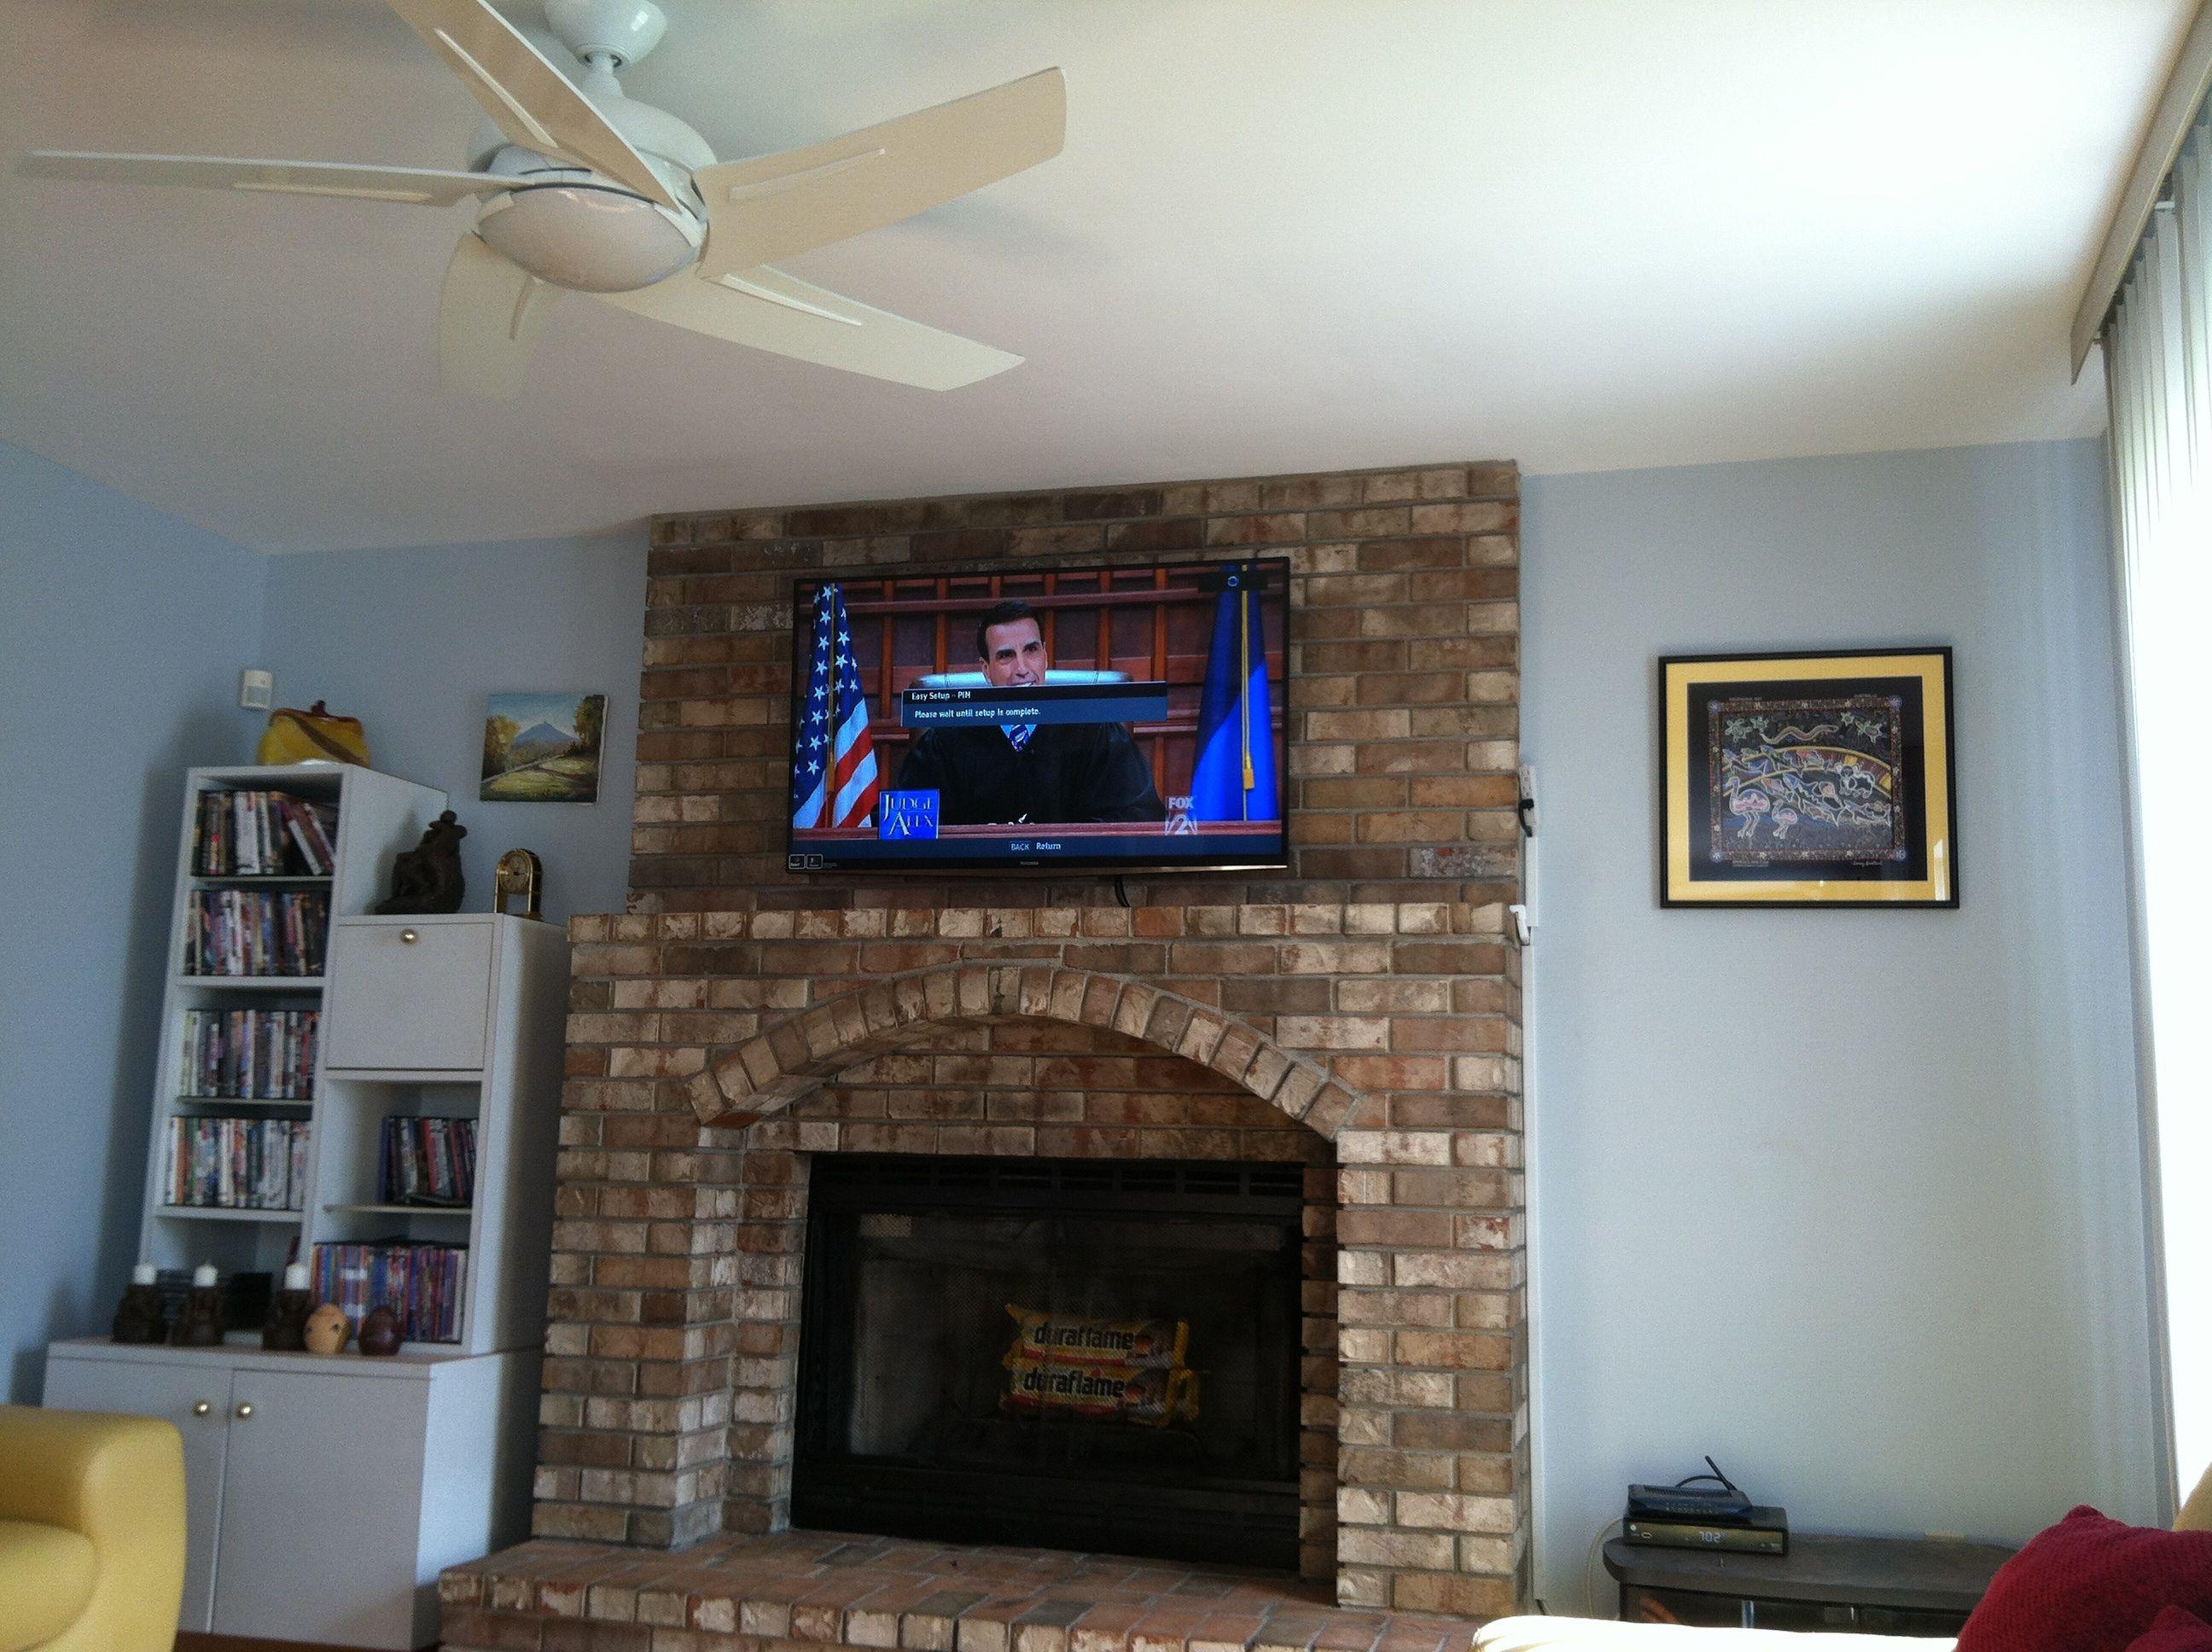 Vesta Fireplace Tv Installation Tv Over Fireplace Brick Fireplace Brick Fireplace Wall Fireplace